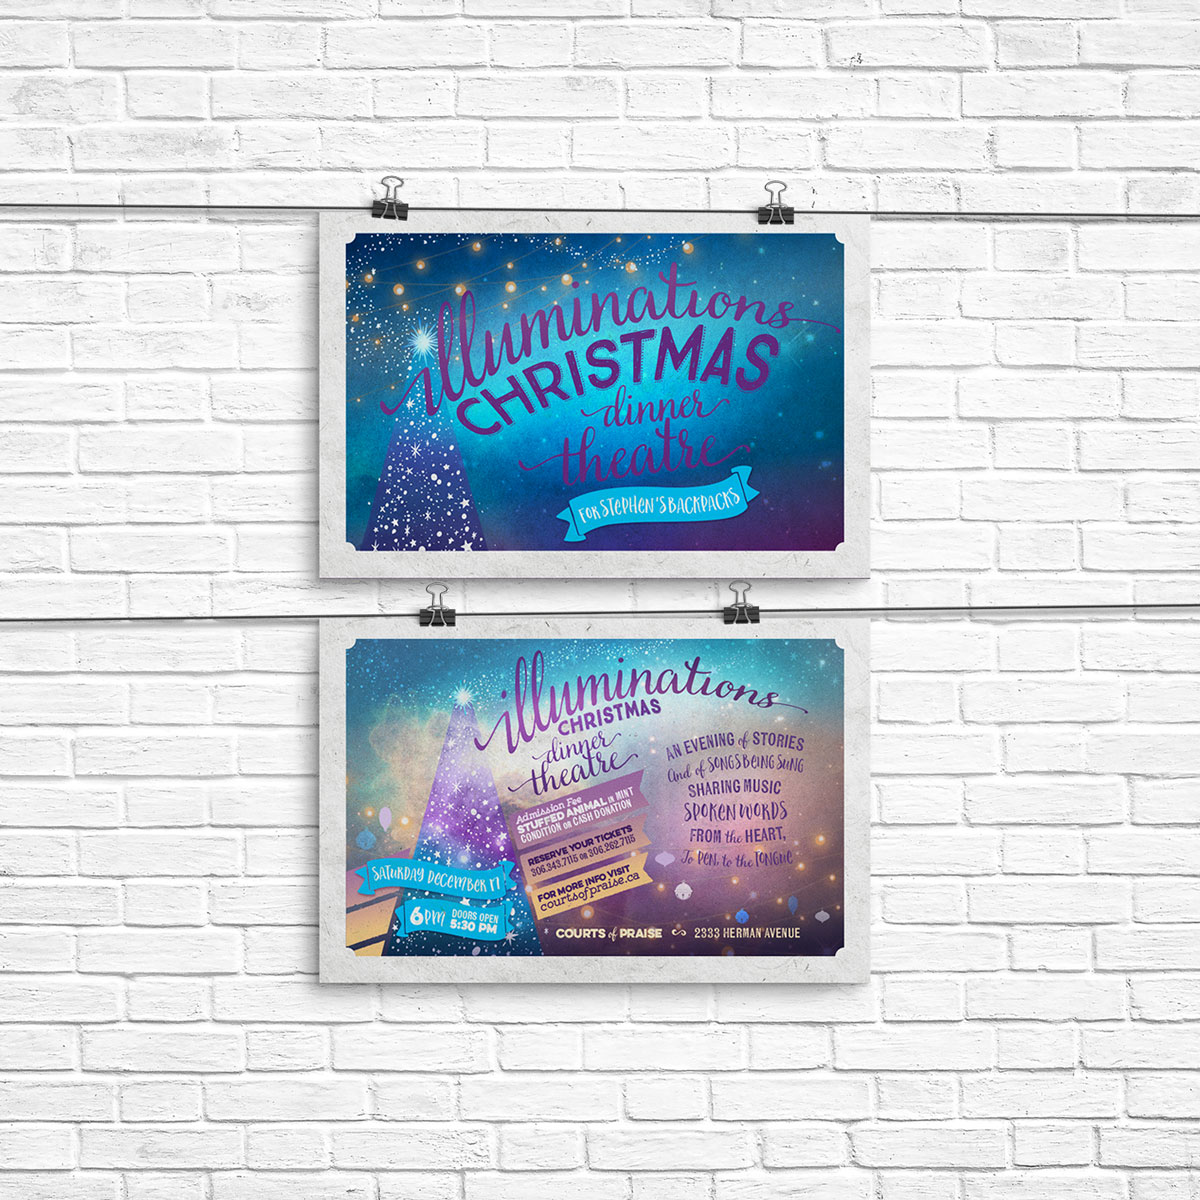 Christmas2016-Invites-BrickWall.jpg